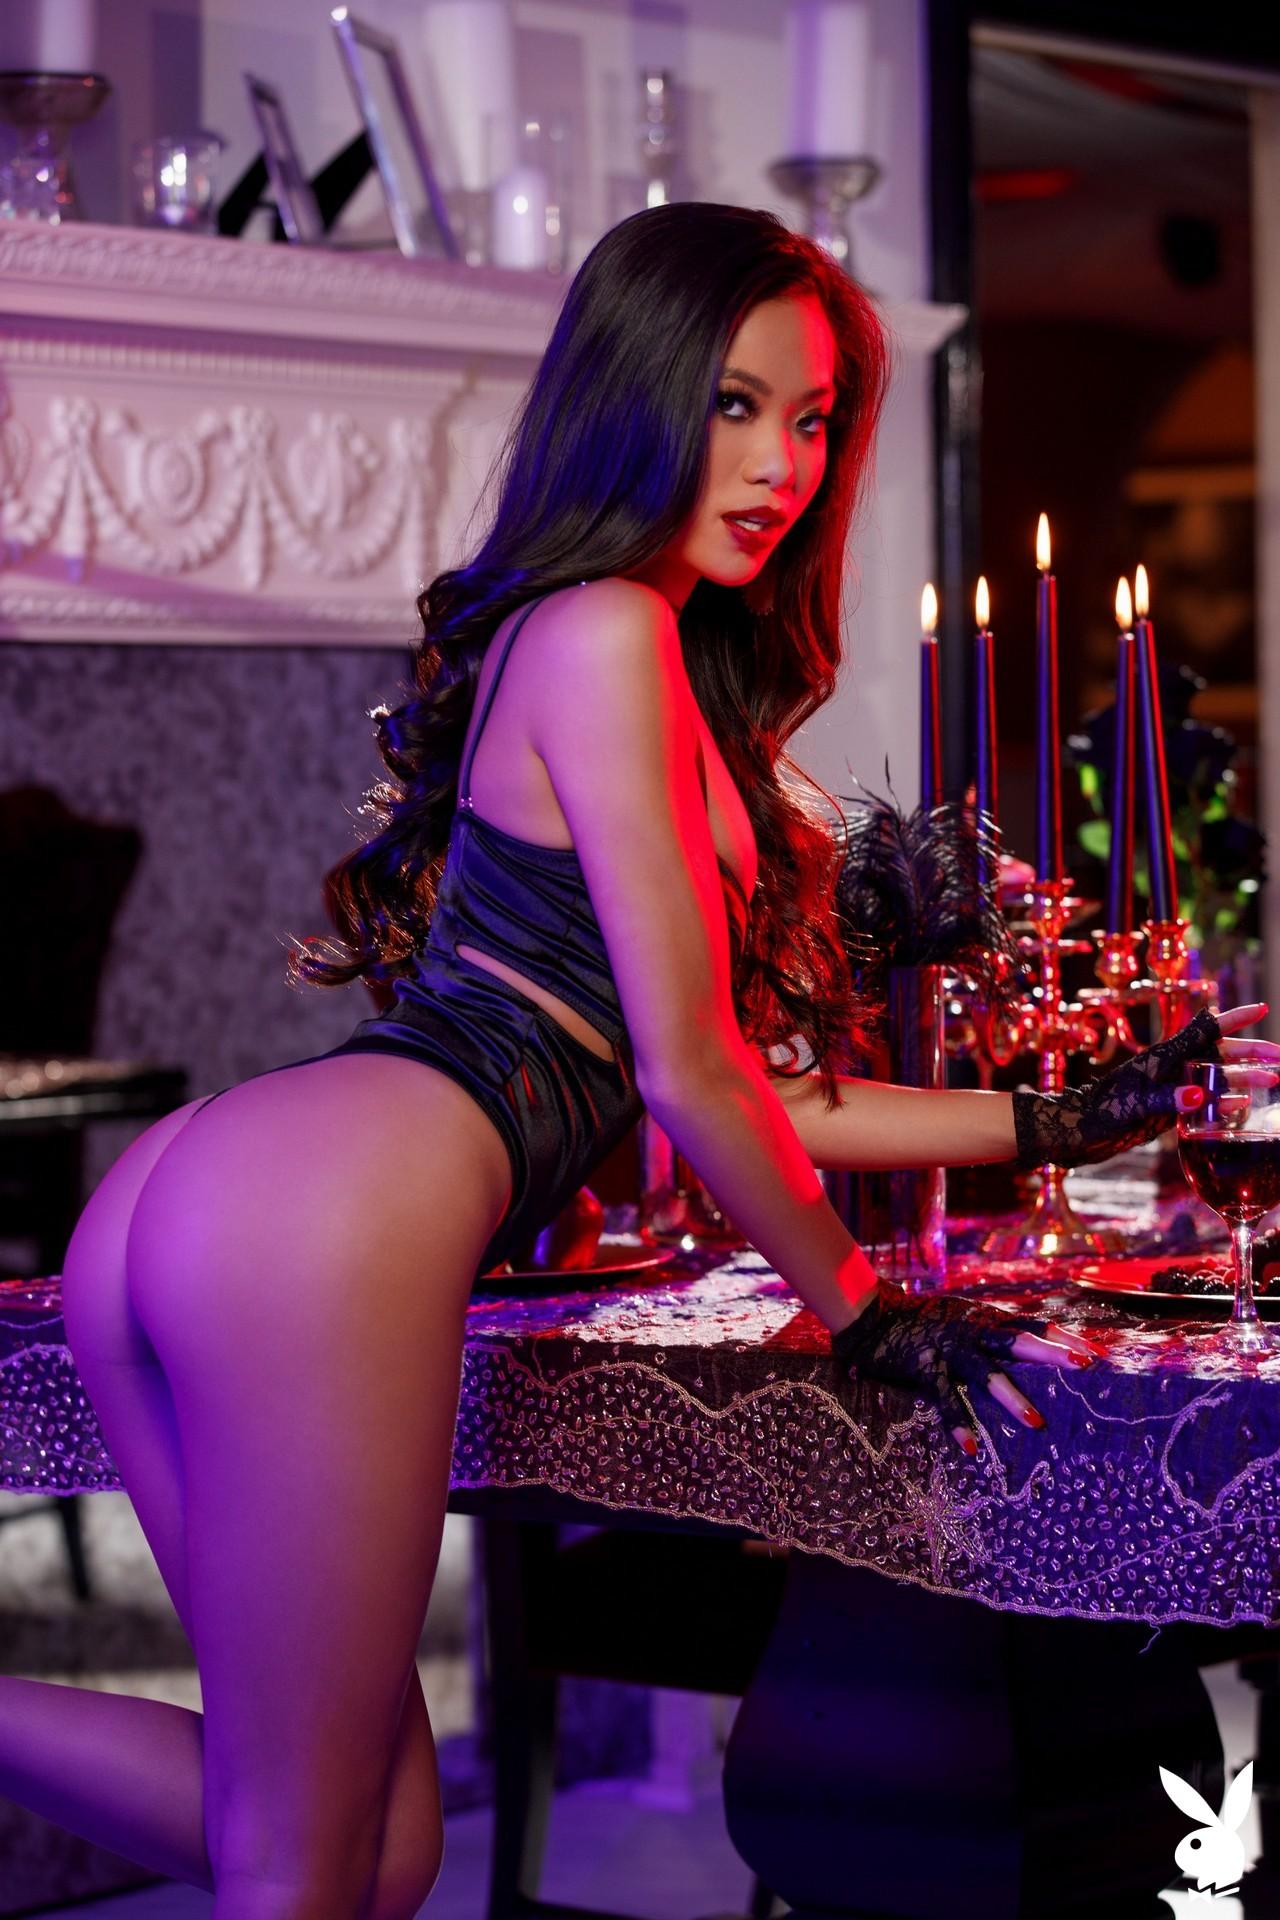 Vina Sky In Midnight Indulgence Playboy Plus (9)